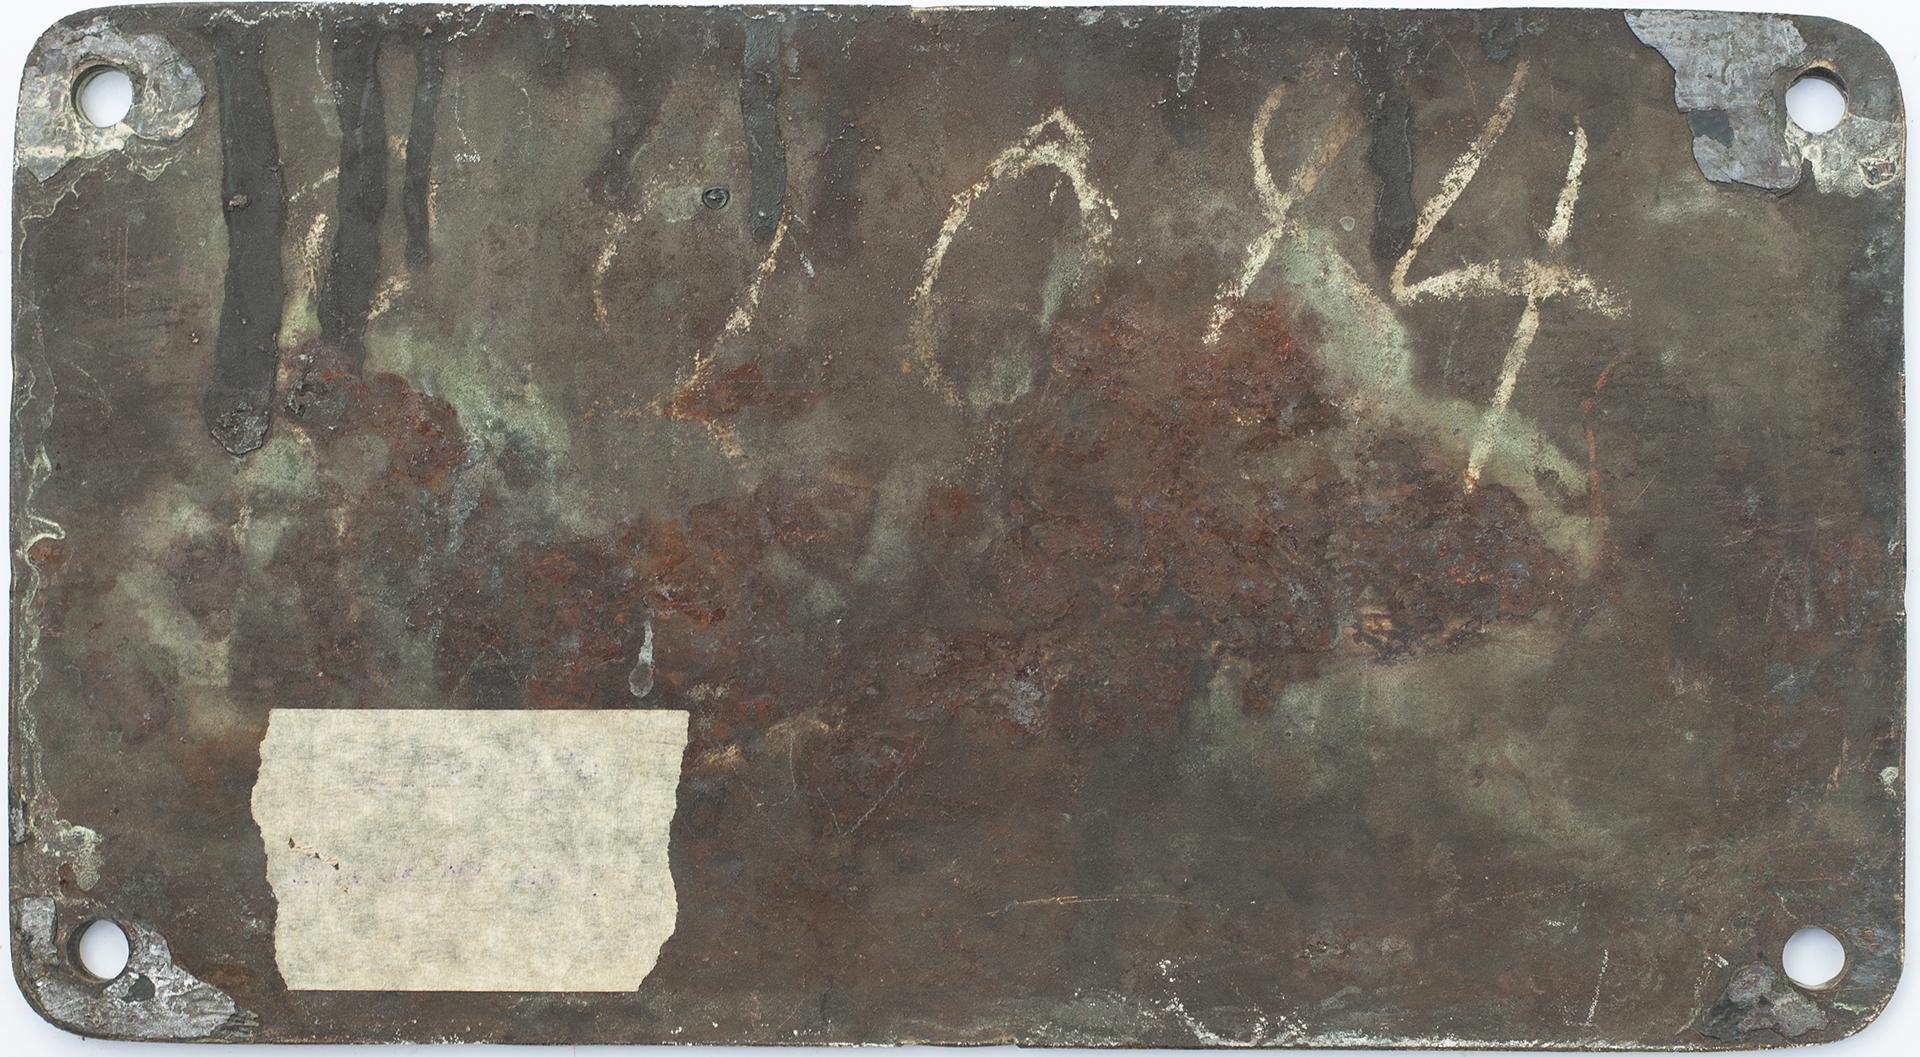 Worksplate FRIED.KRUPP A.G. LOKOMOTIVFABRIK ESSEN GERMANY Nr.1860 1939. Ex South African Railways - Image 2 of 2